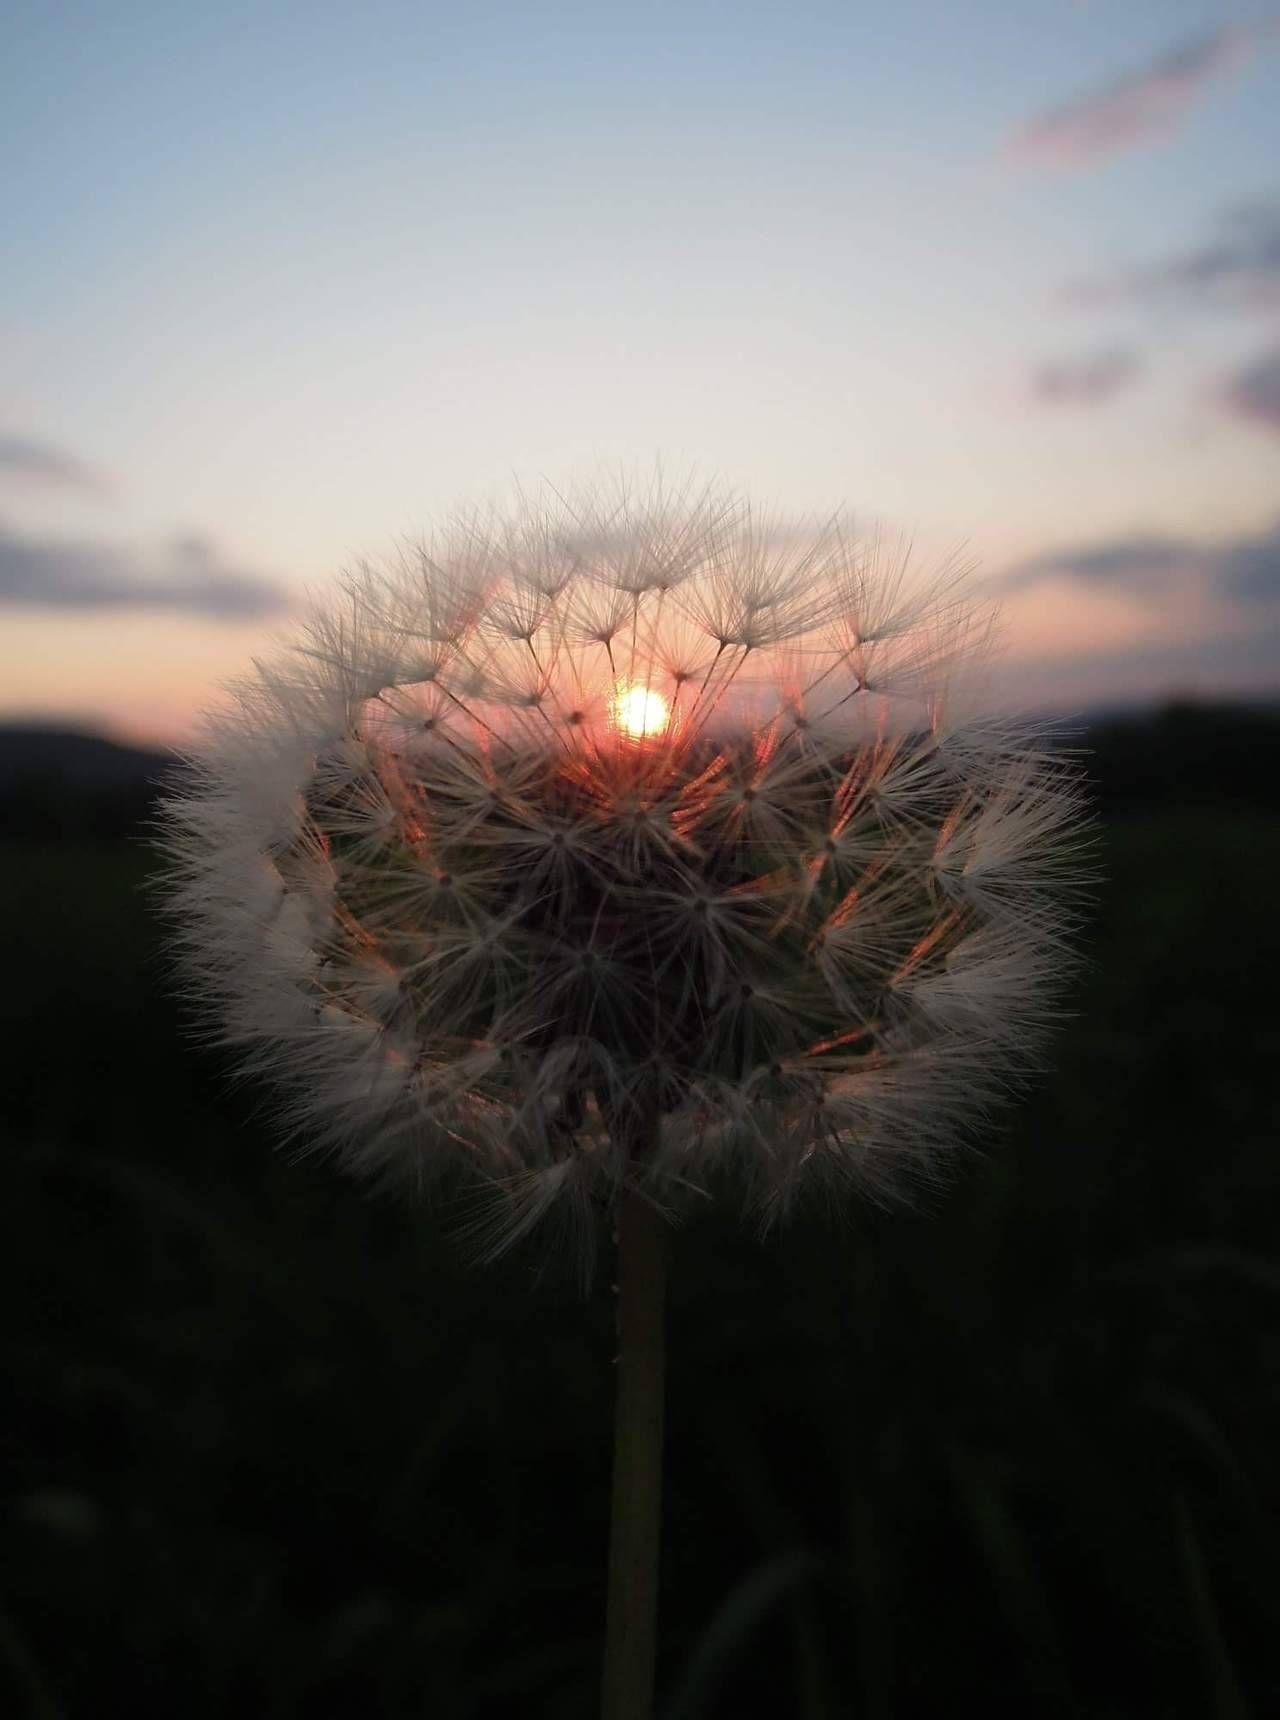 Sunset Dandelion Aesthetic Aesthetic Photography Nature Nature Aesthetic Flower Aesthetic